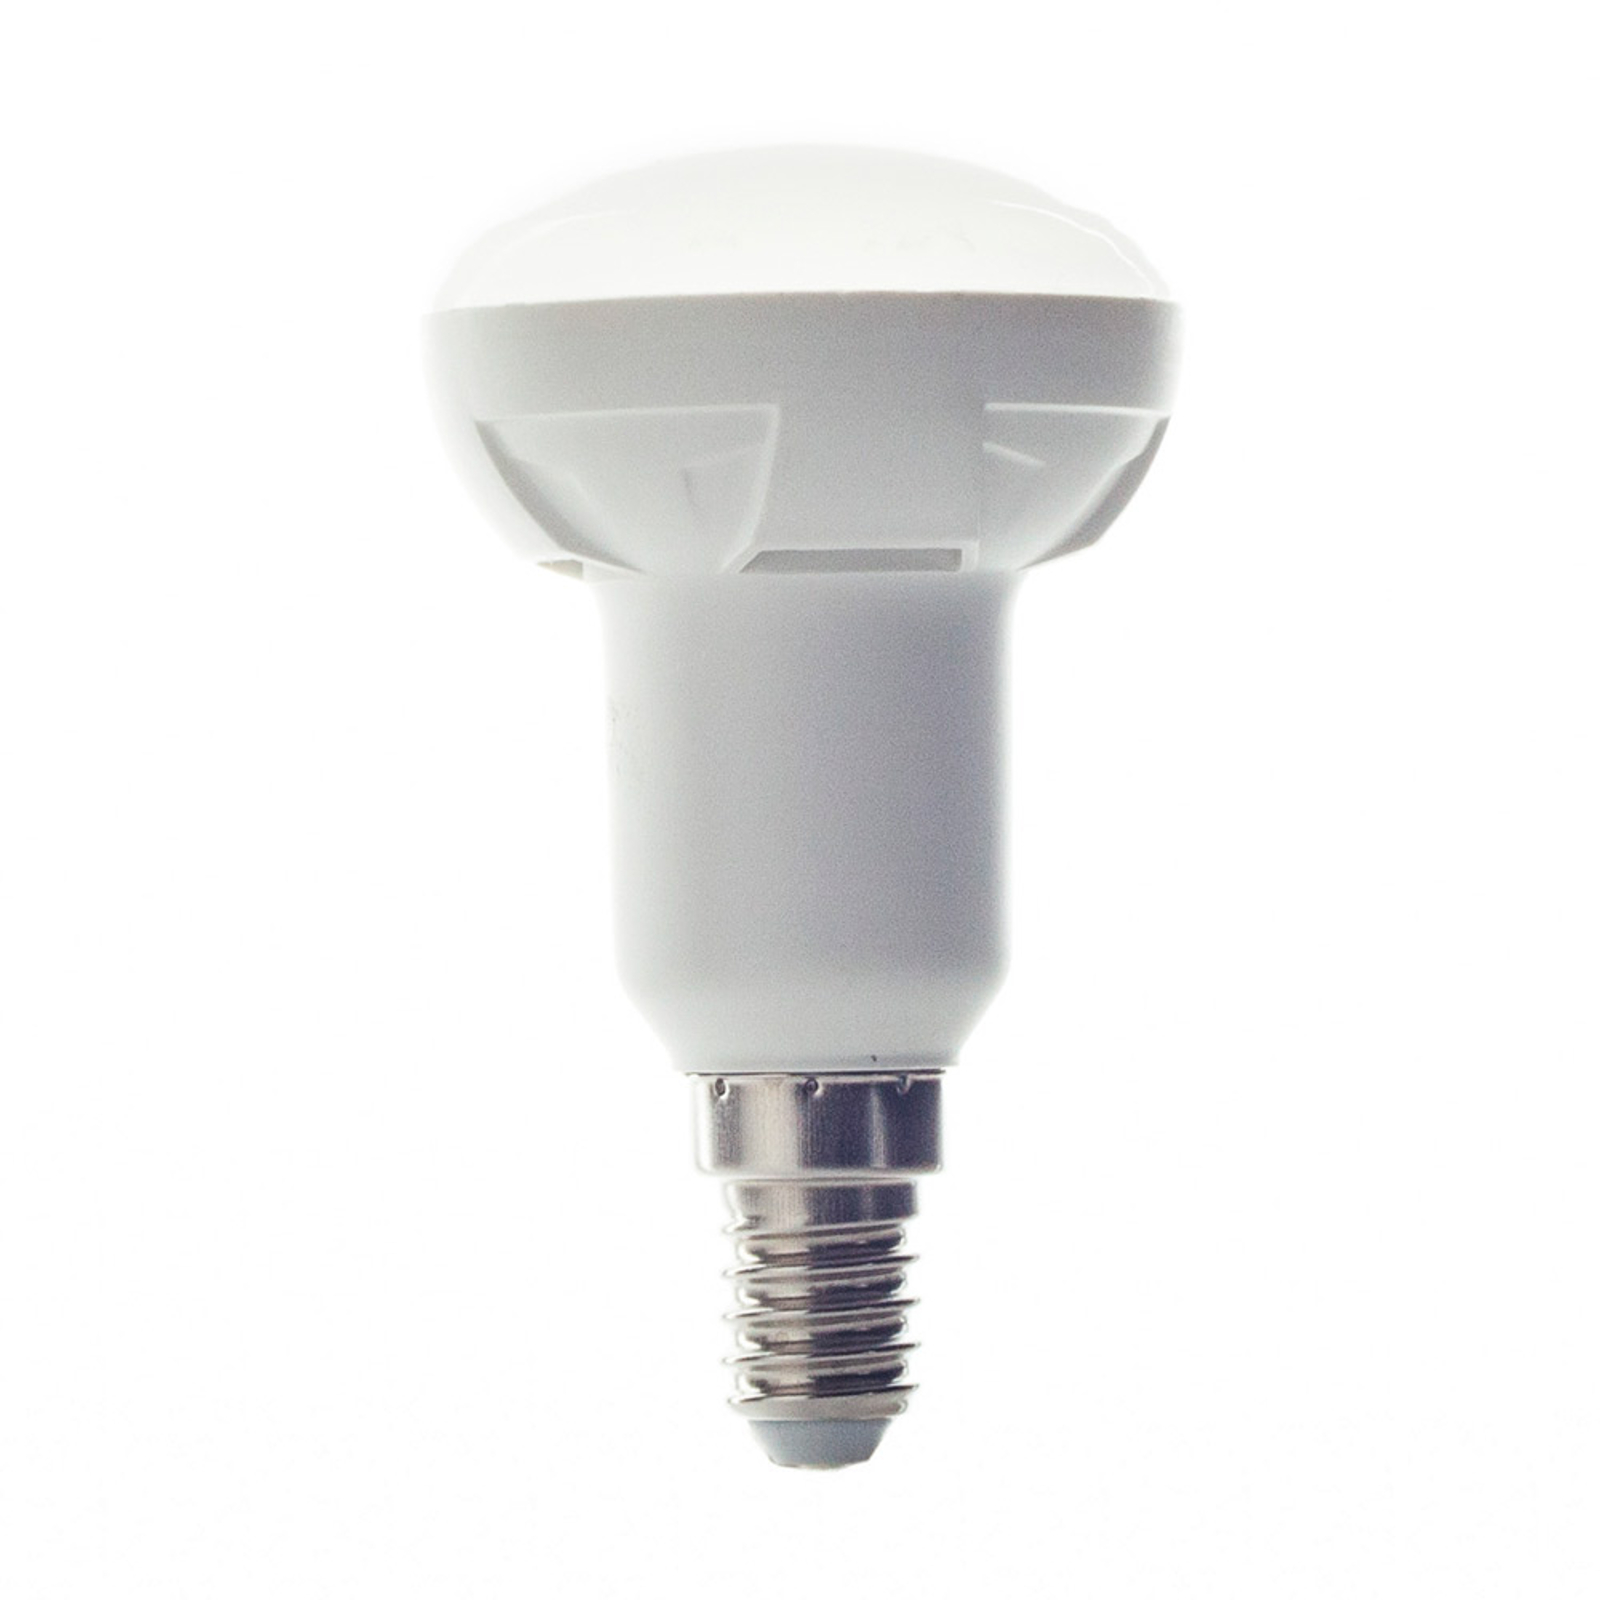 E14 7W 830 LED-reflectorlamp R50 warm-wit 120gr